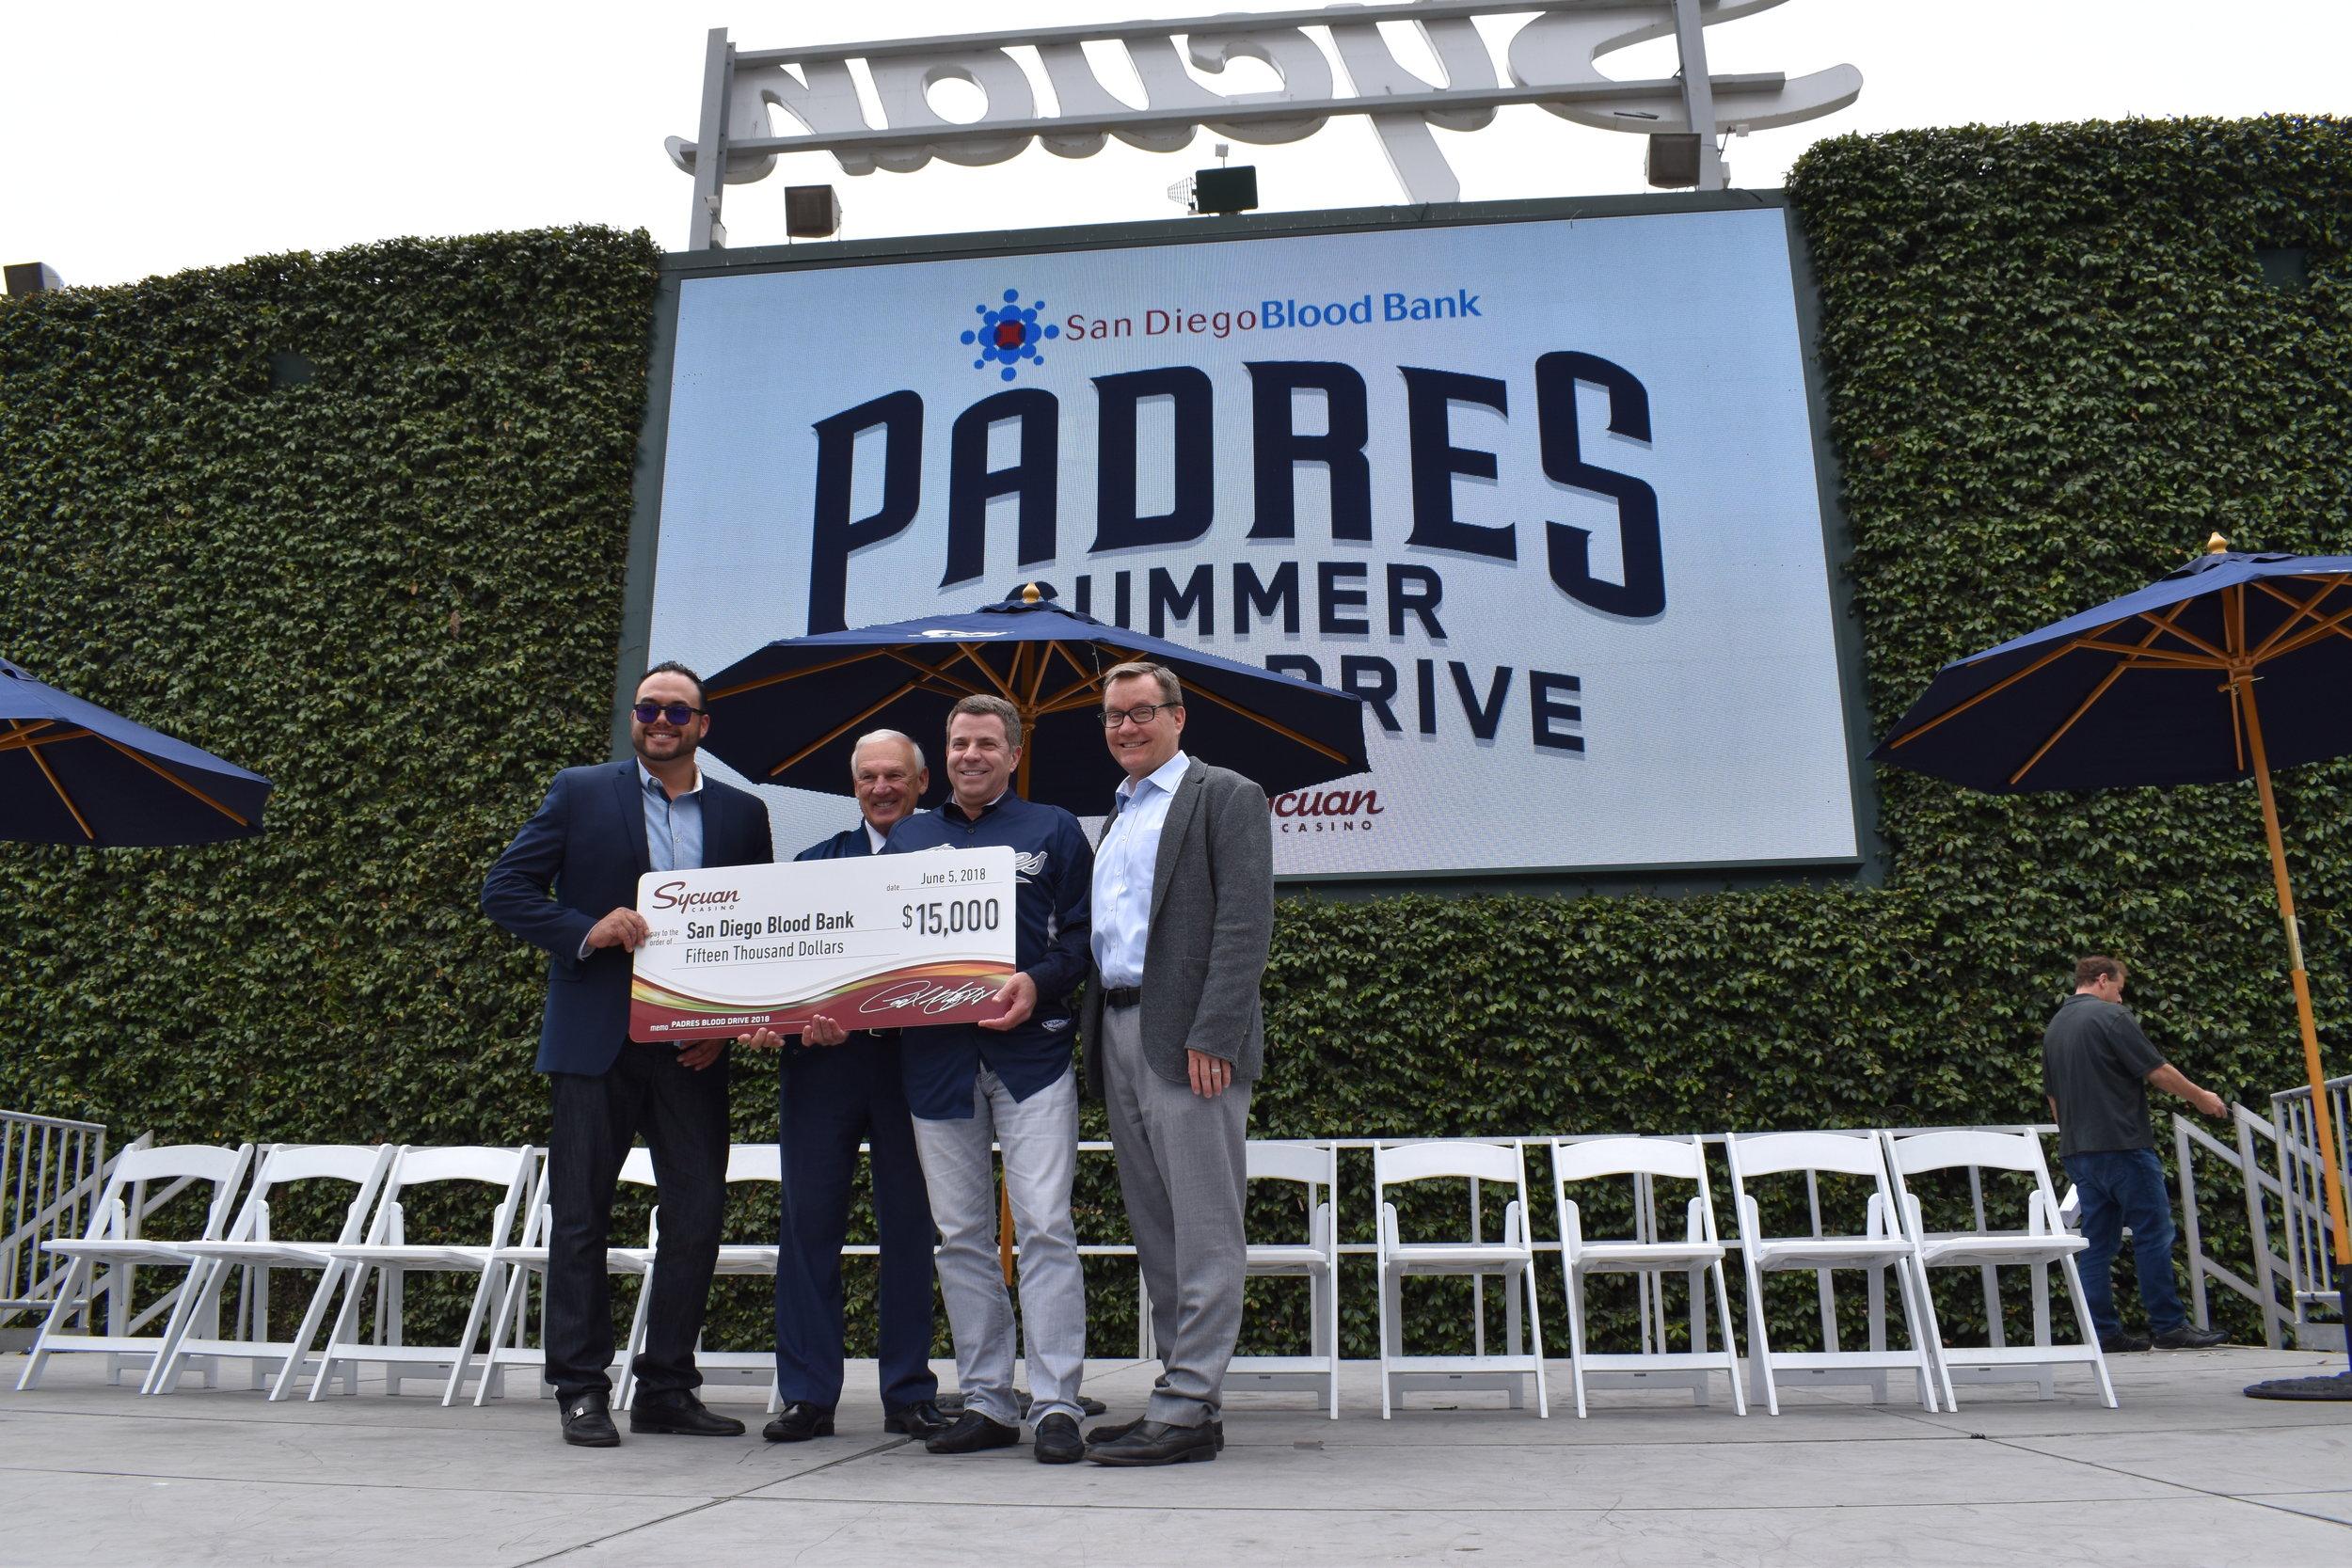 Padres_2018_2.JPG